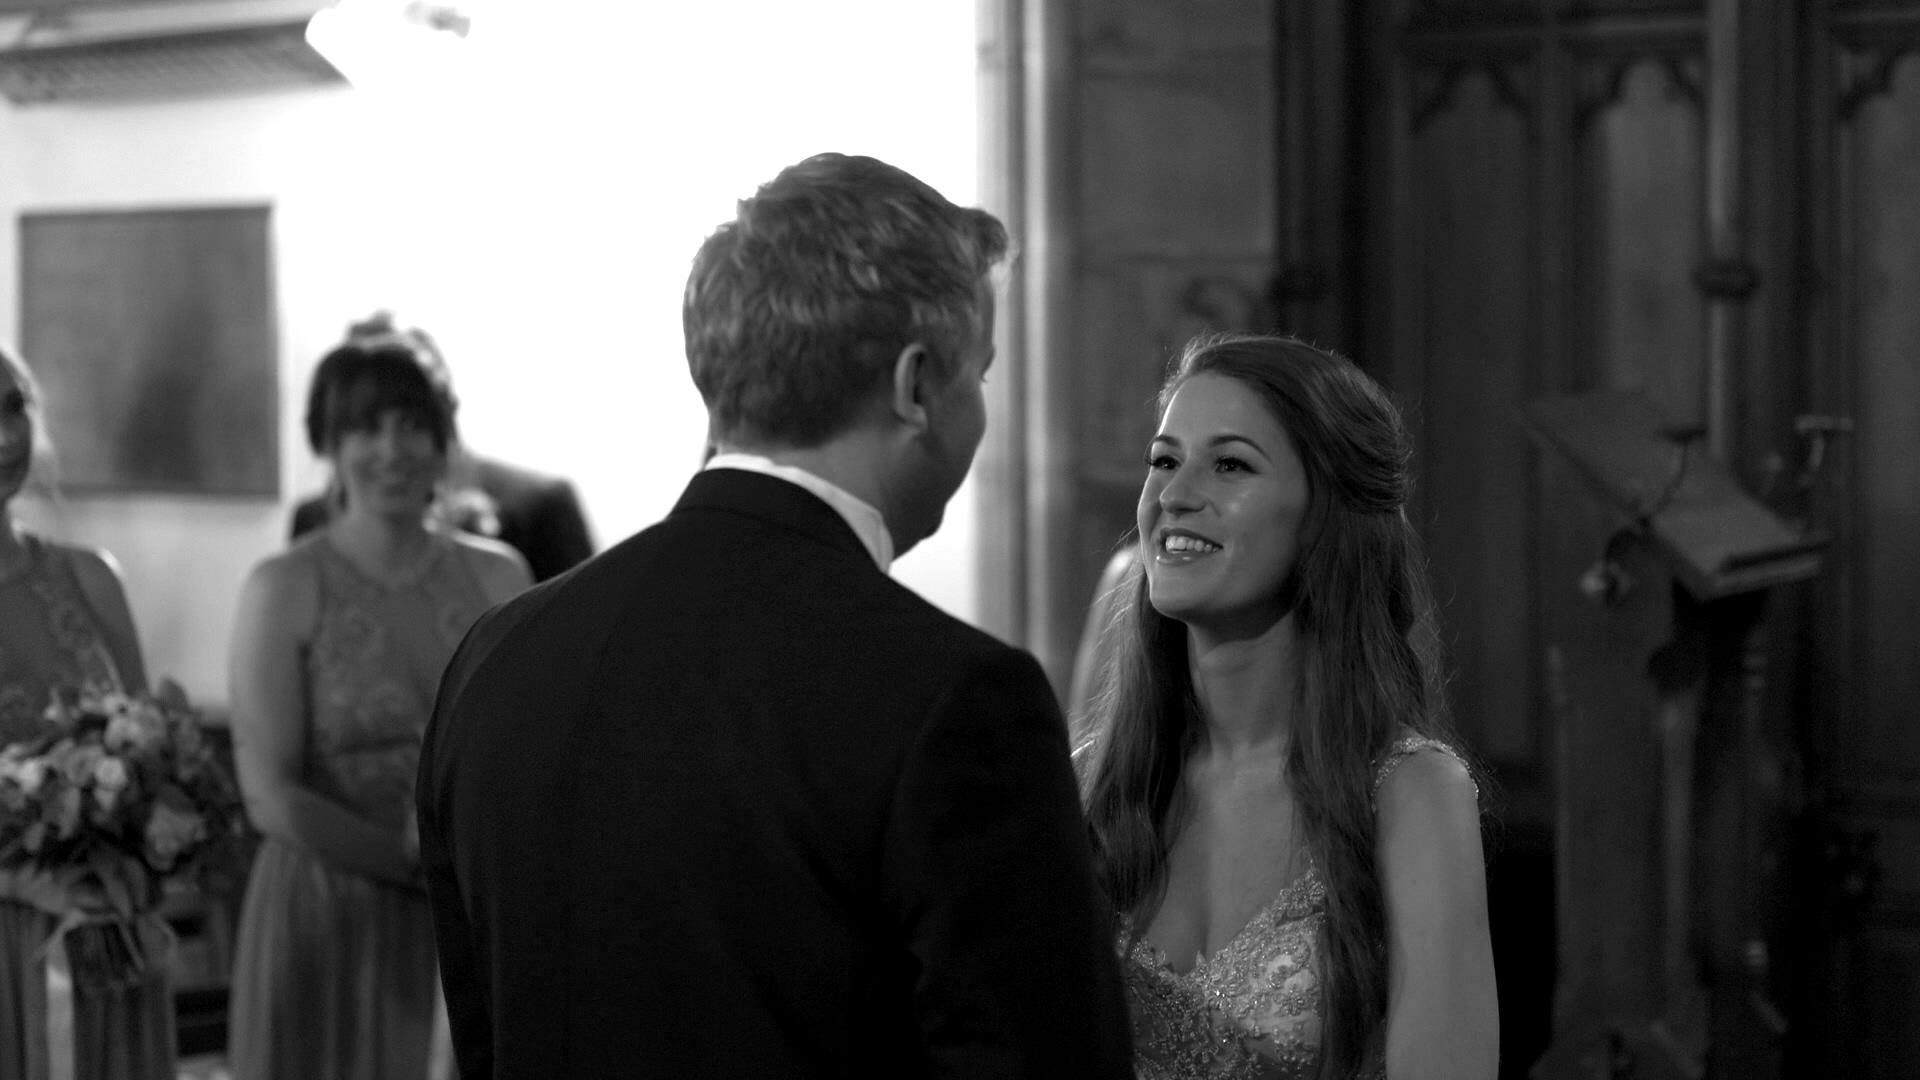 DRUMTOCHTY-SUMMER-WEDDING (11).jpg